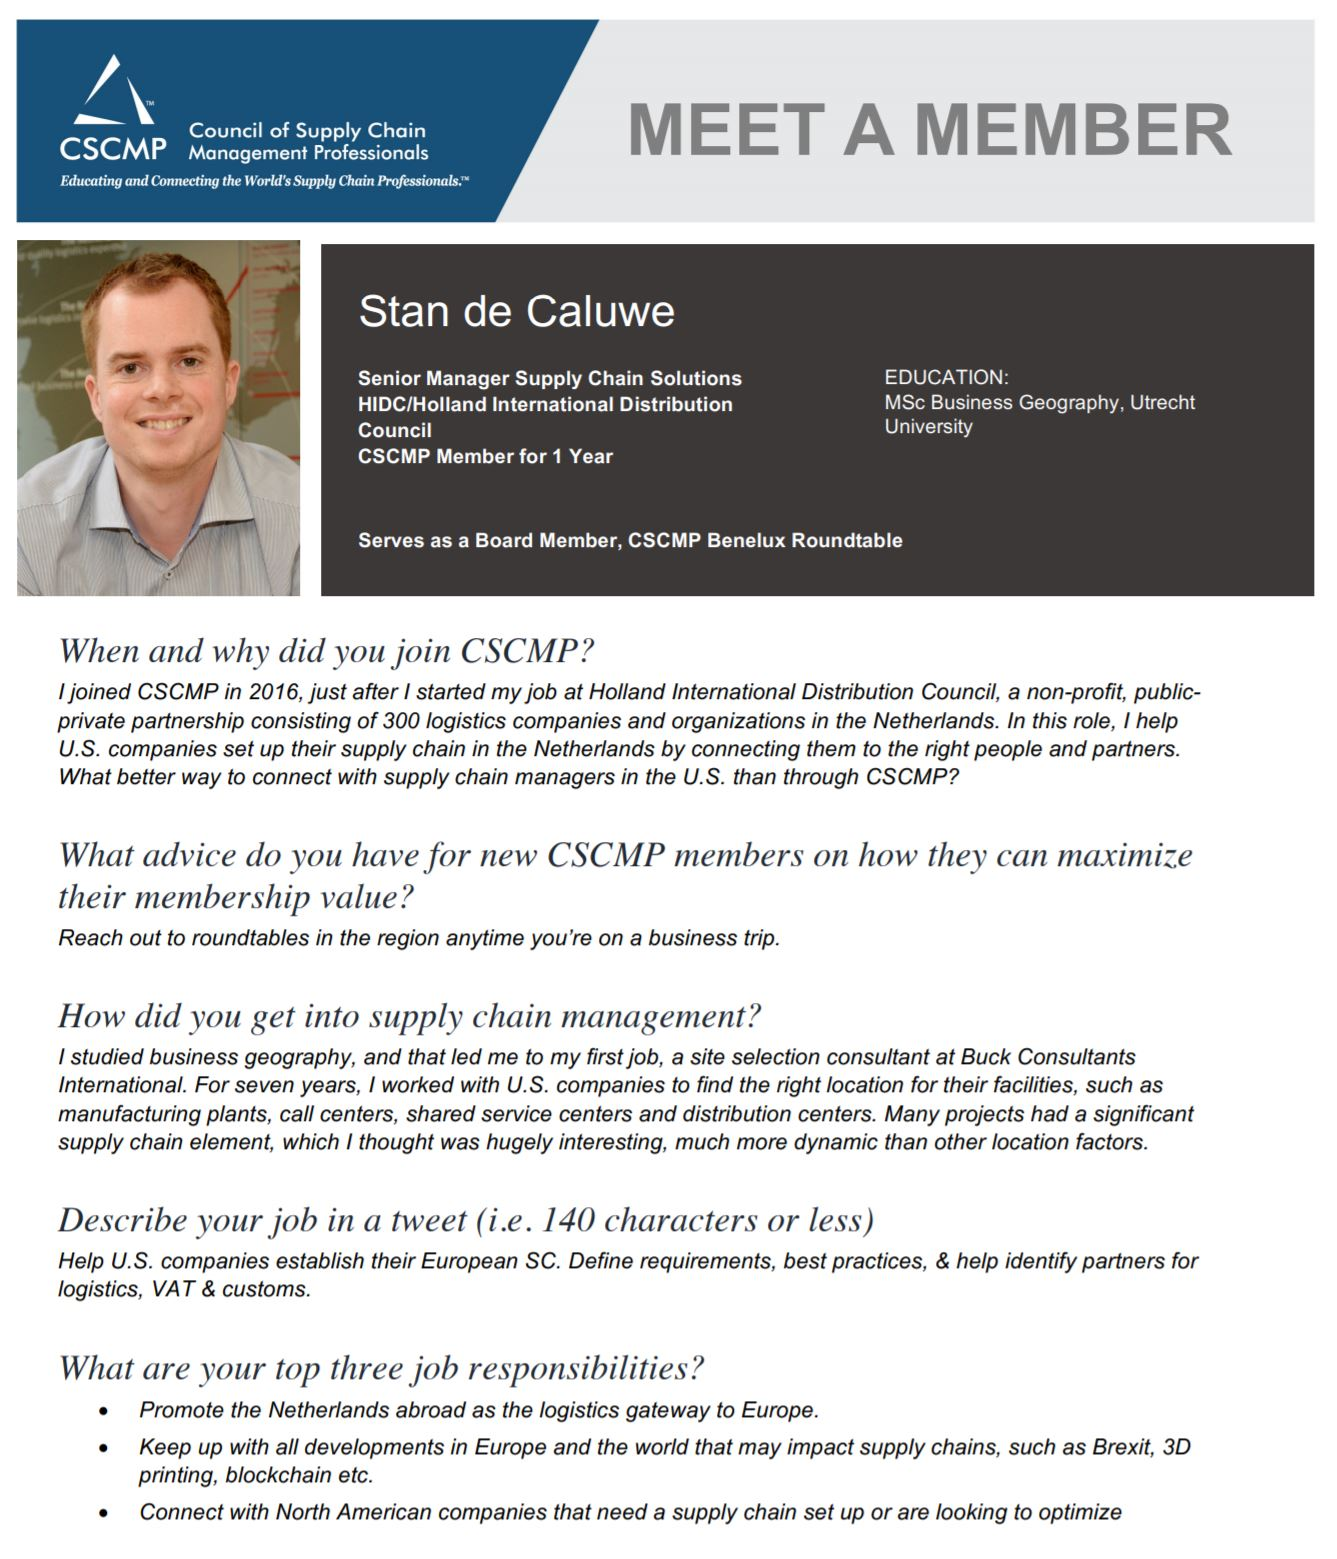 Meet a Member: Stan de Caluwe